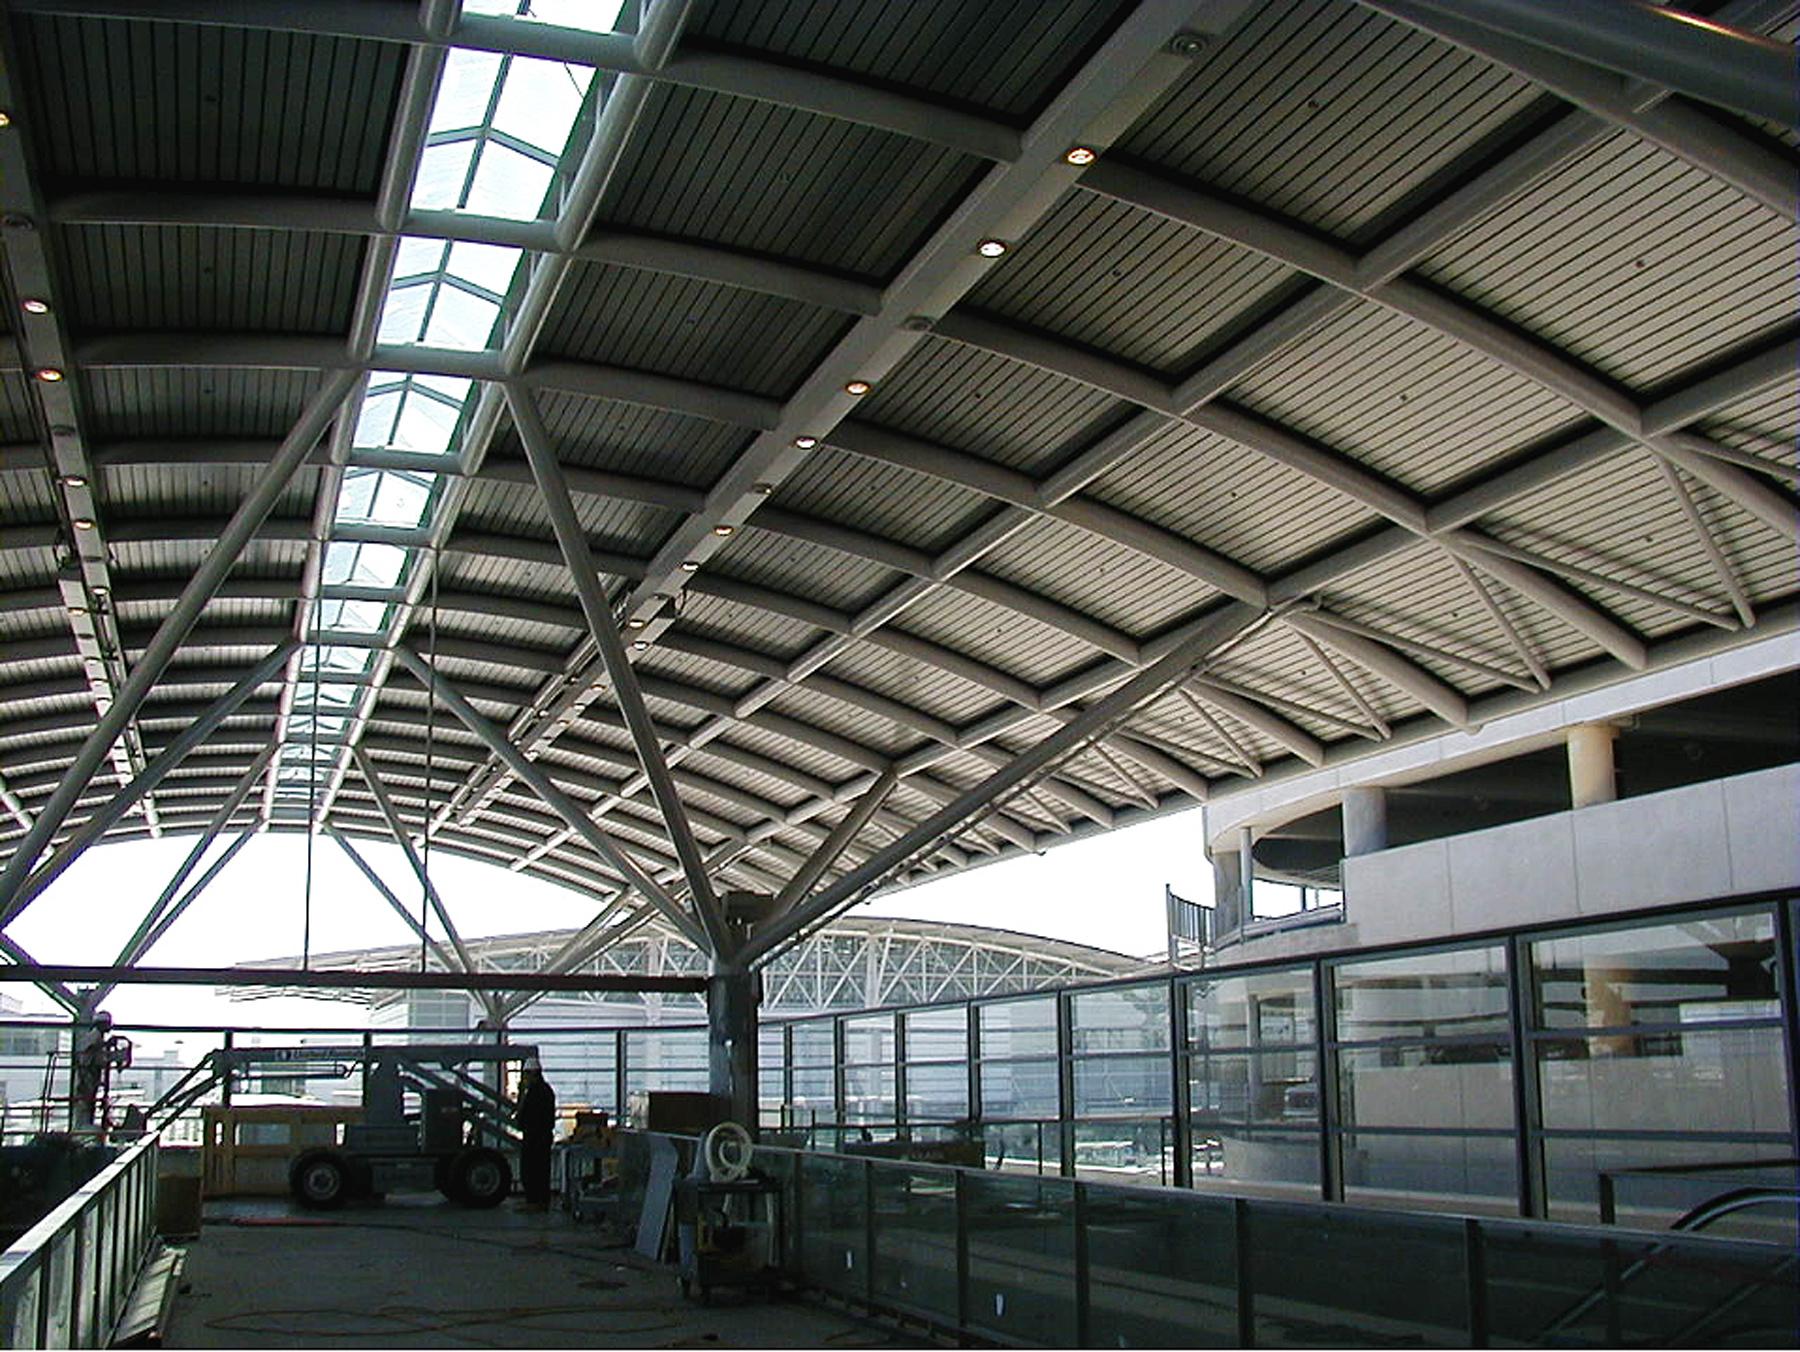 Bart Station Hunter Douglas Architectural